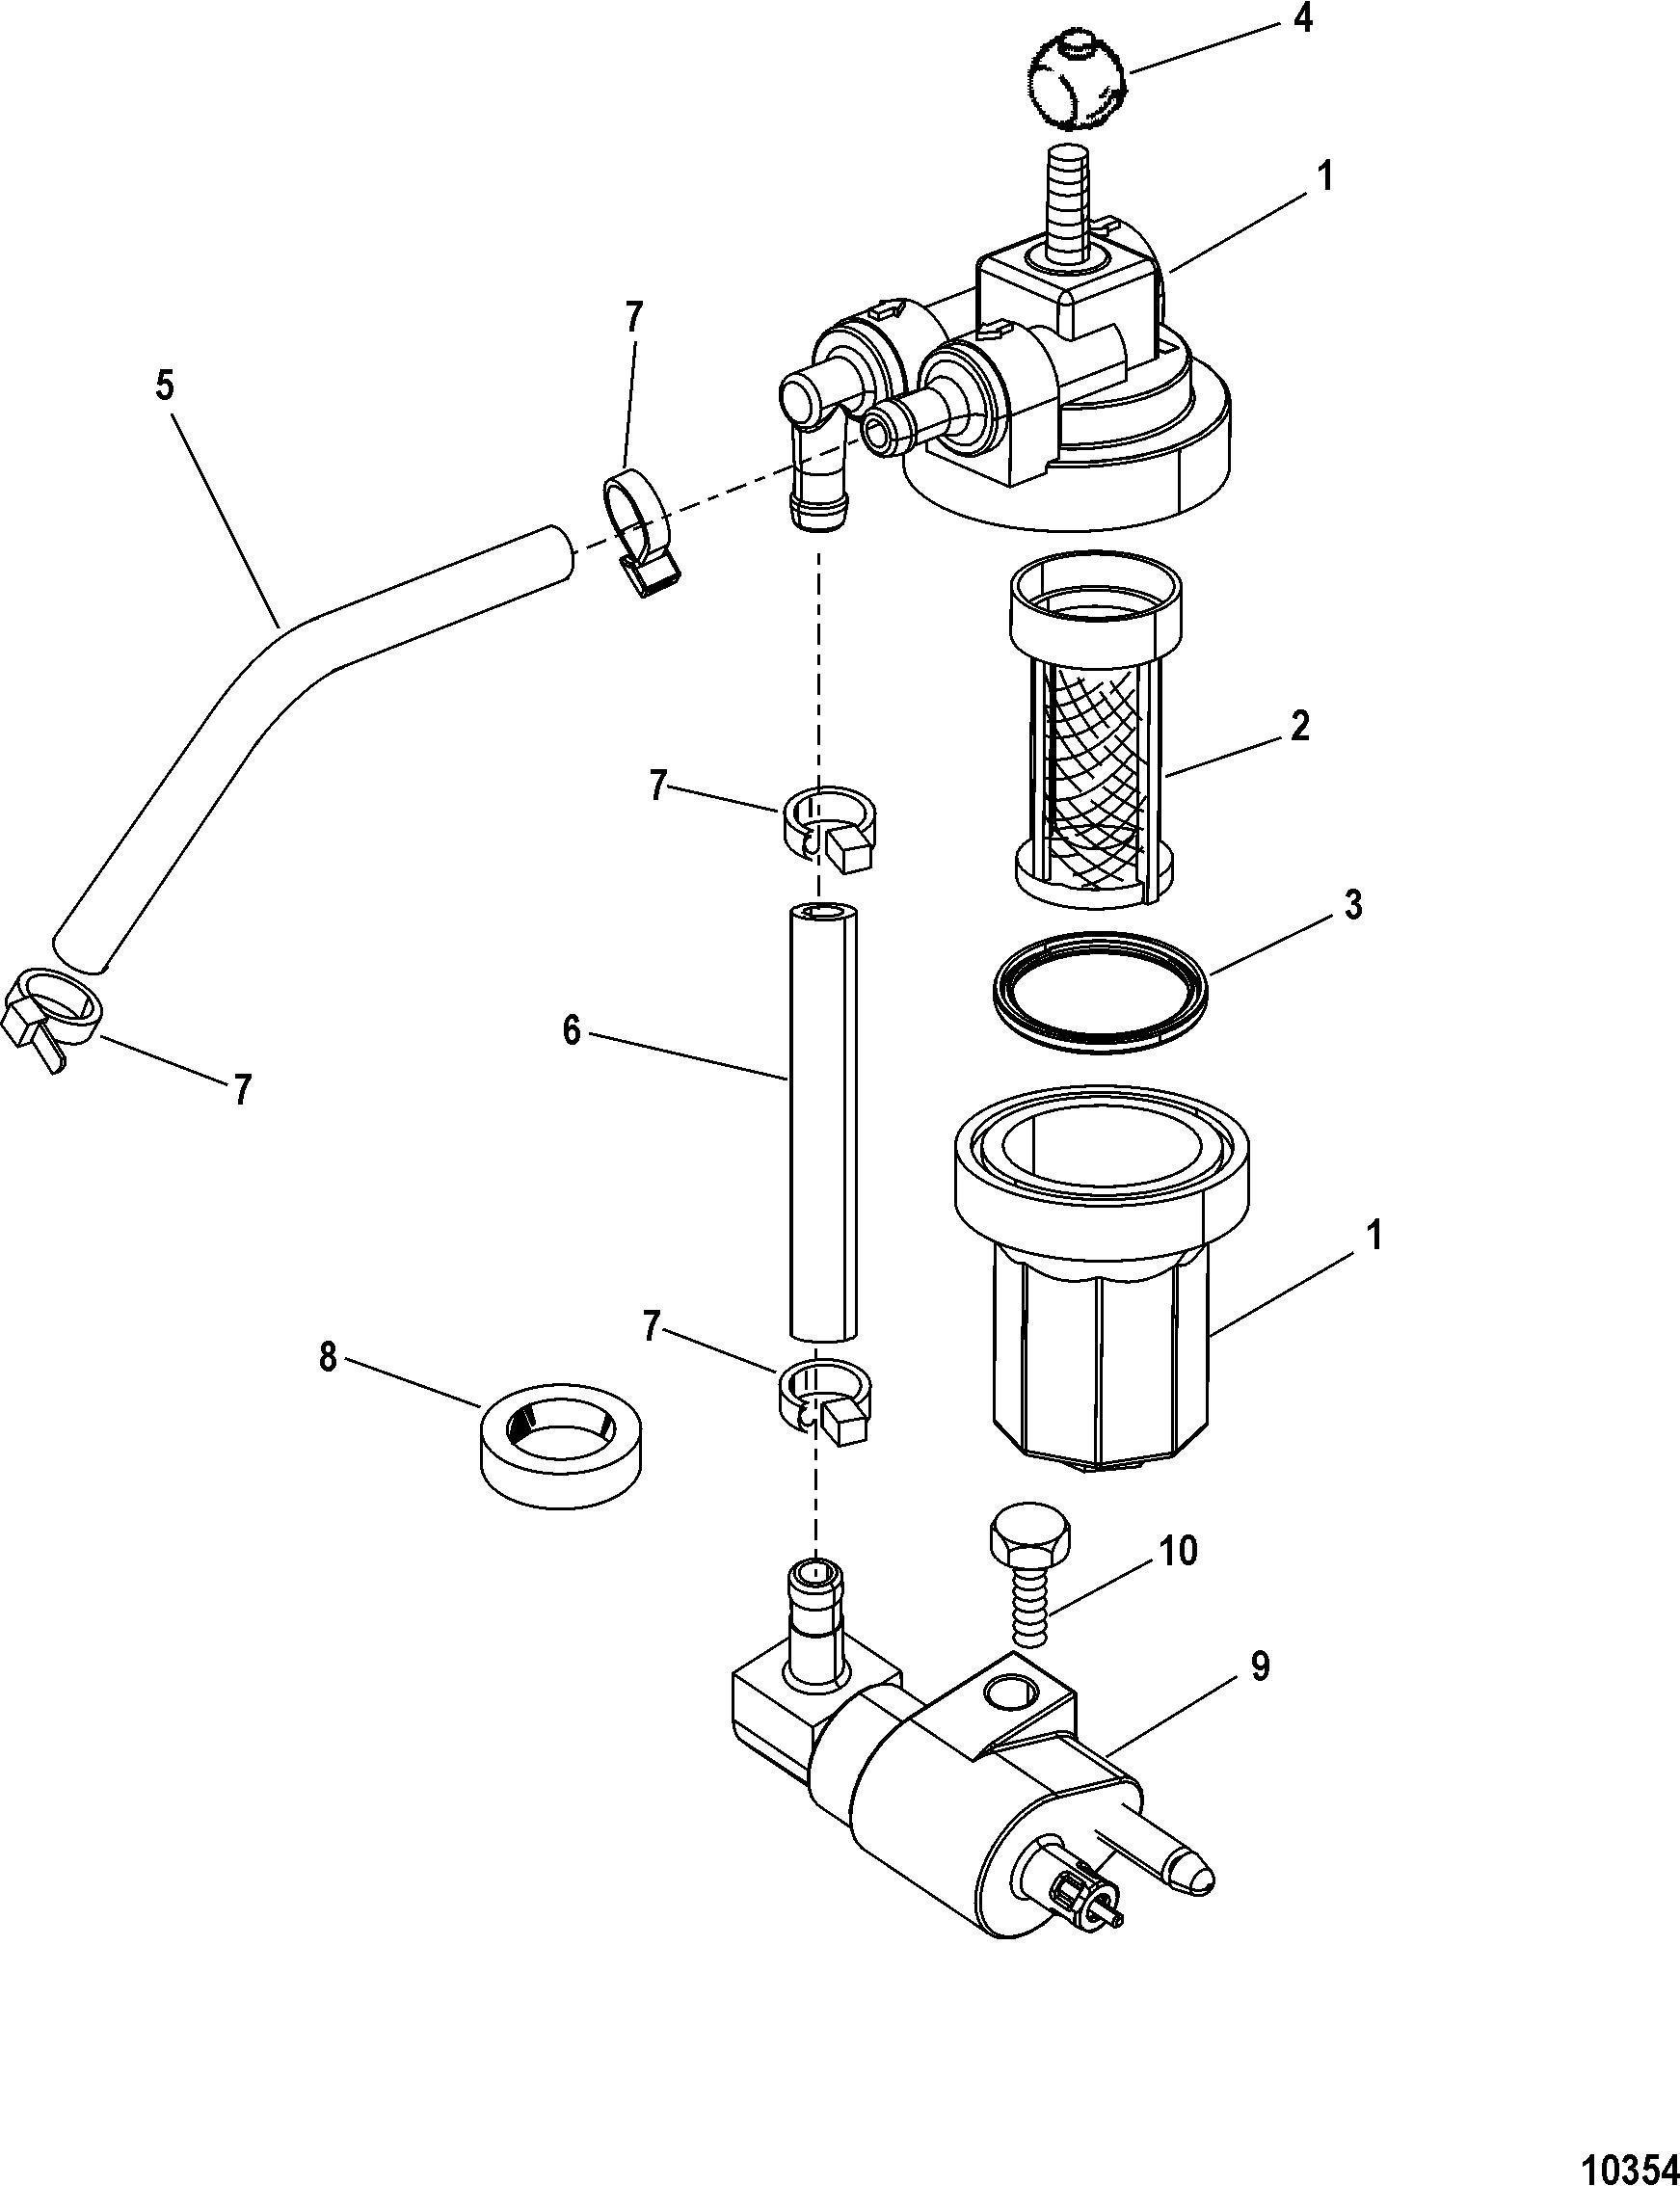 1996 chrysler cirrus engine diagram 2002 chrysler voyager